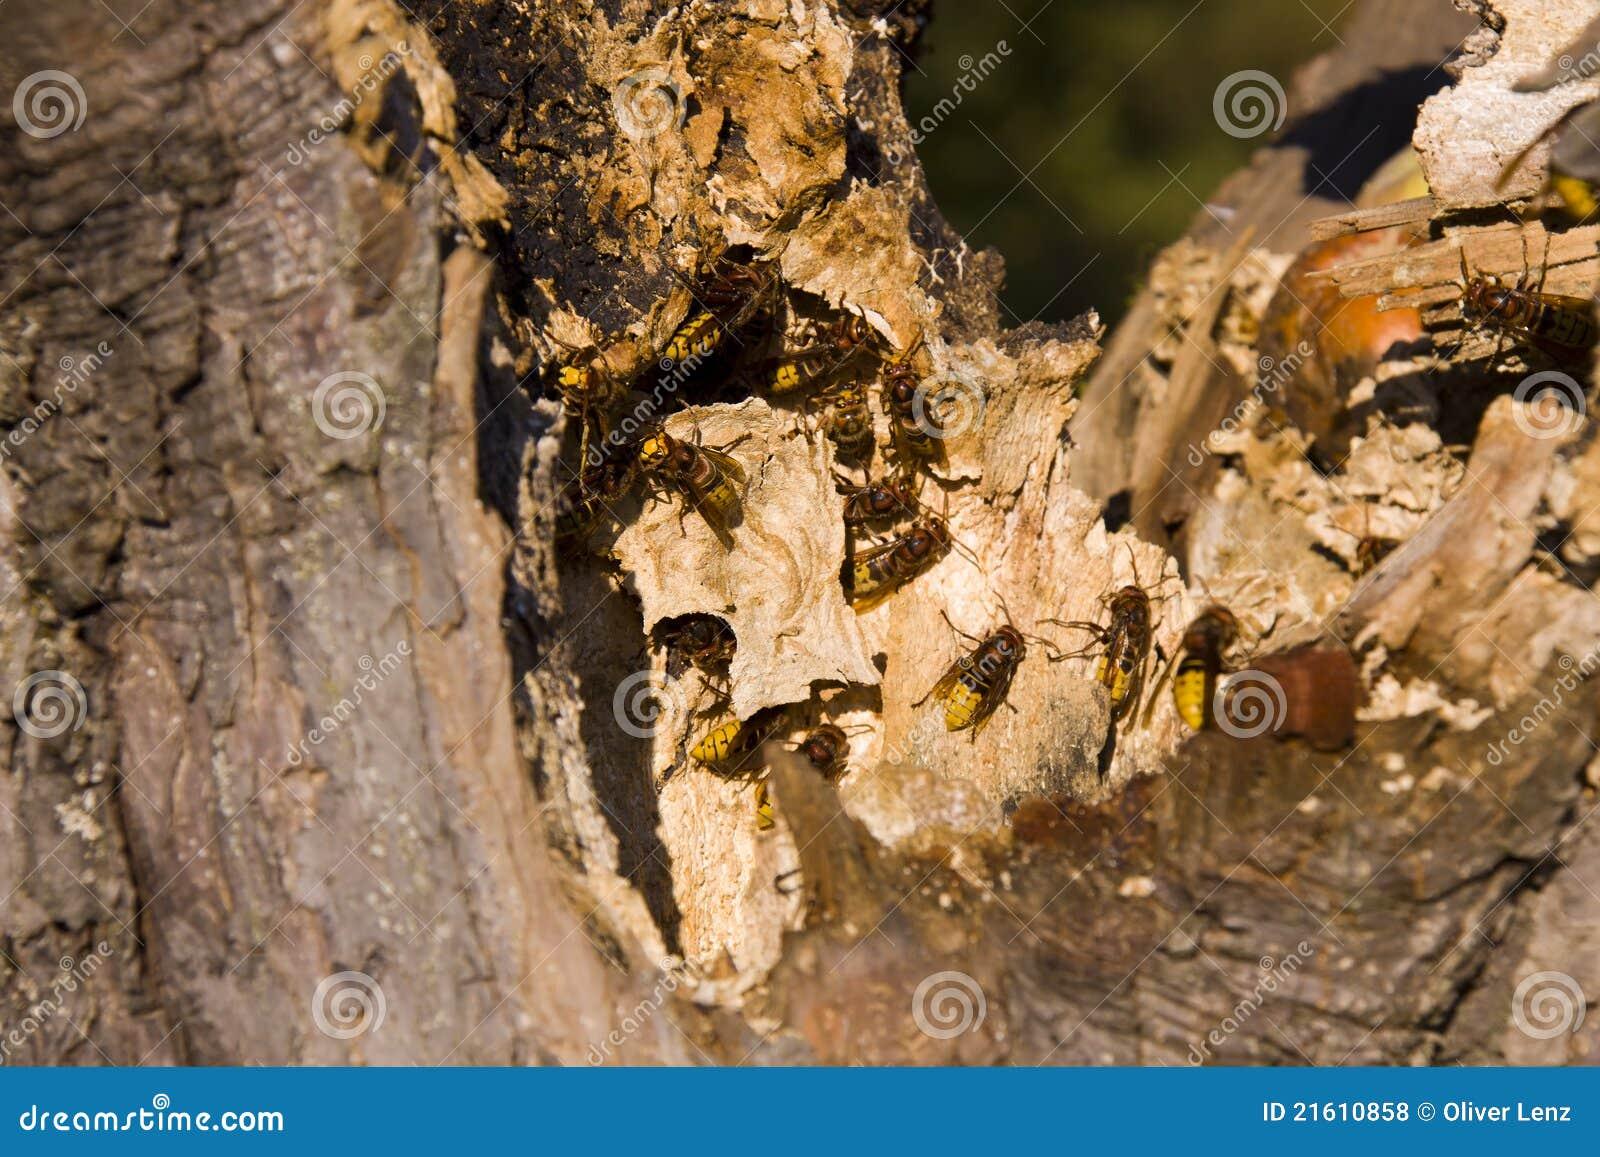 Hornets Nesting In Tree Stump Royalty Free Stock Photos ...